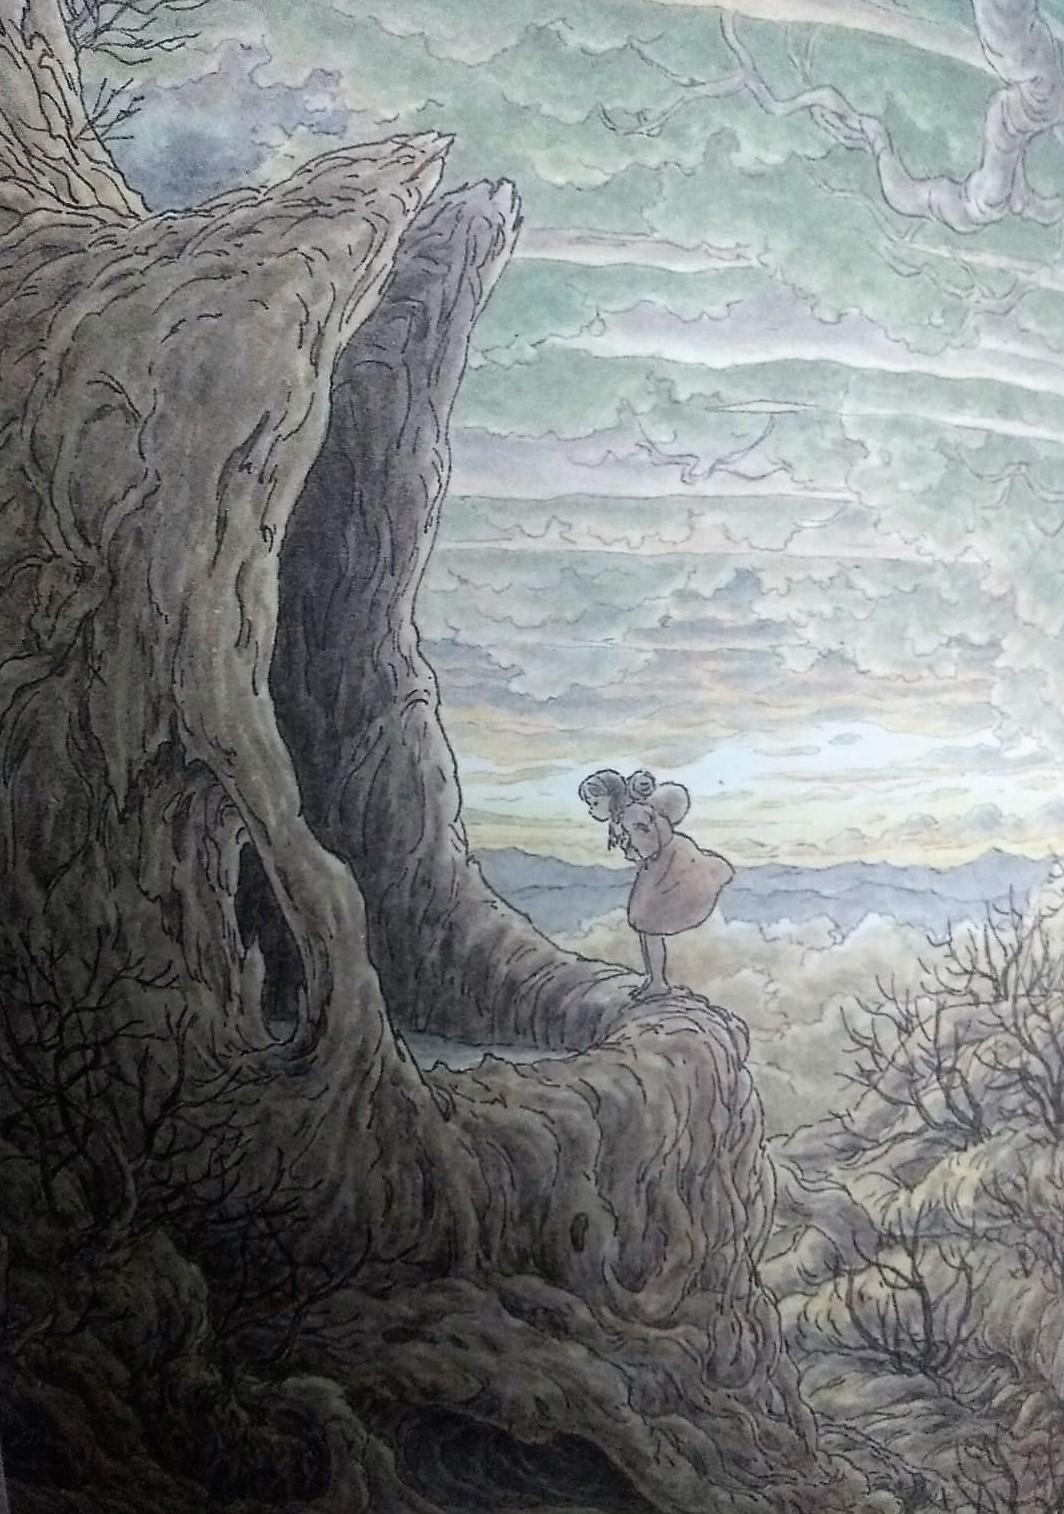 The Tree in the Middle of the World: Late Ghibli Animator Makiko Futaki's Magical Picture Book